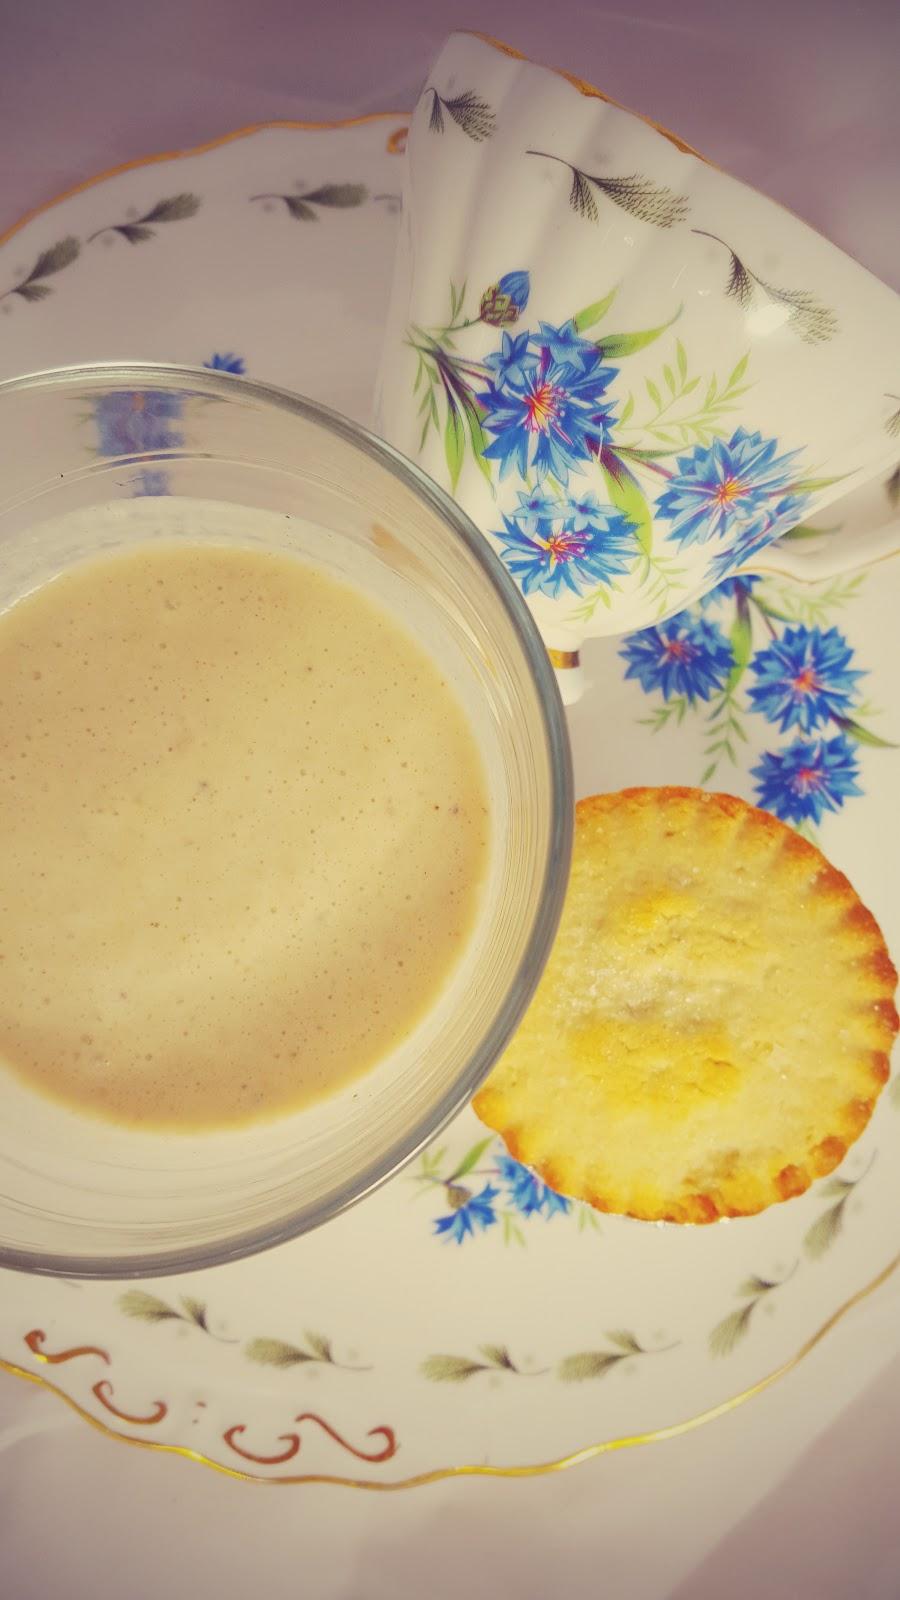 Mince Pie And Cream Posh Milkshake: Tastes Amazing